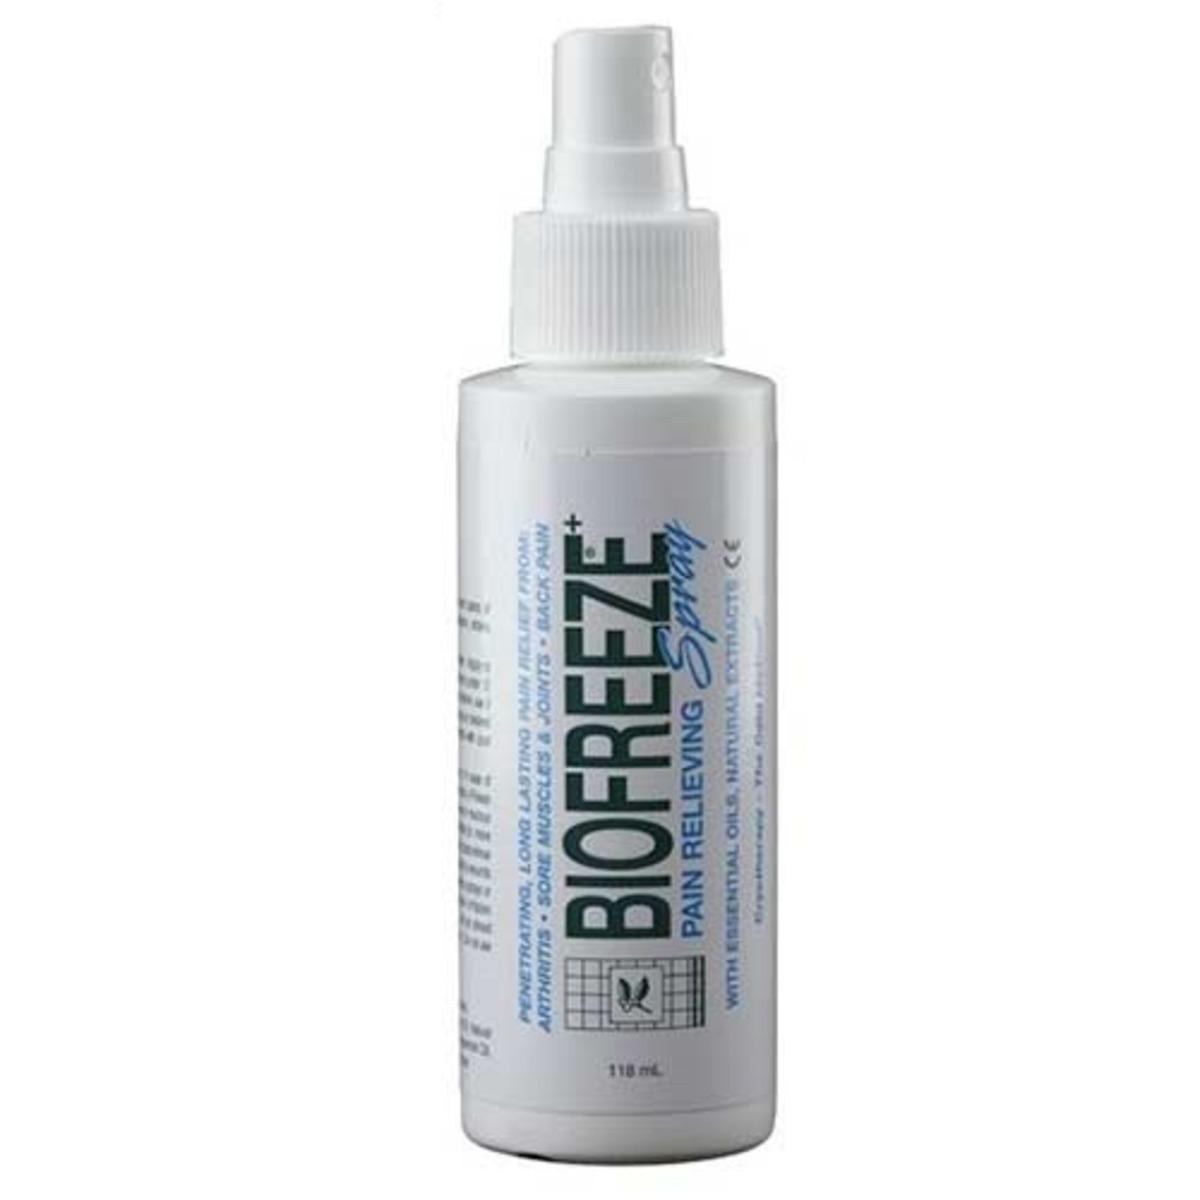 Magnézium Olaj Joint (ízületi) spray 15ml   Teafaolaj, Olaj, Vitaminok